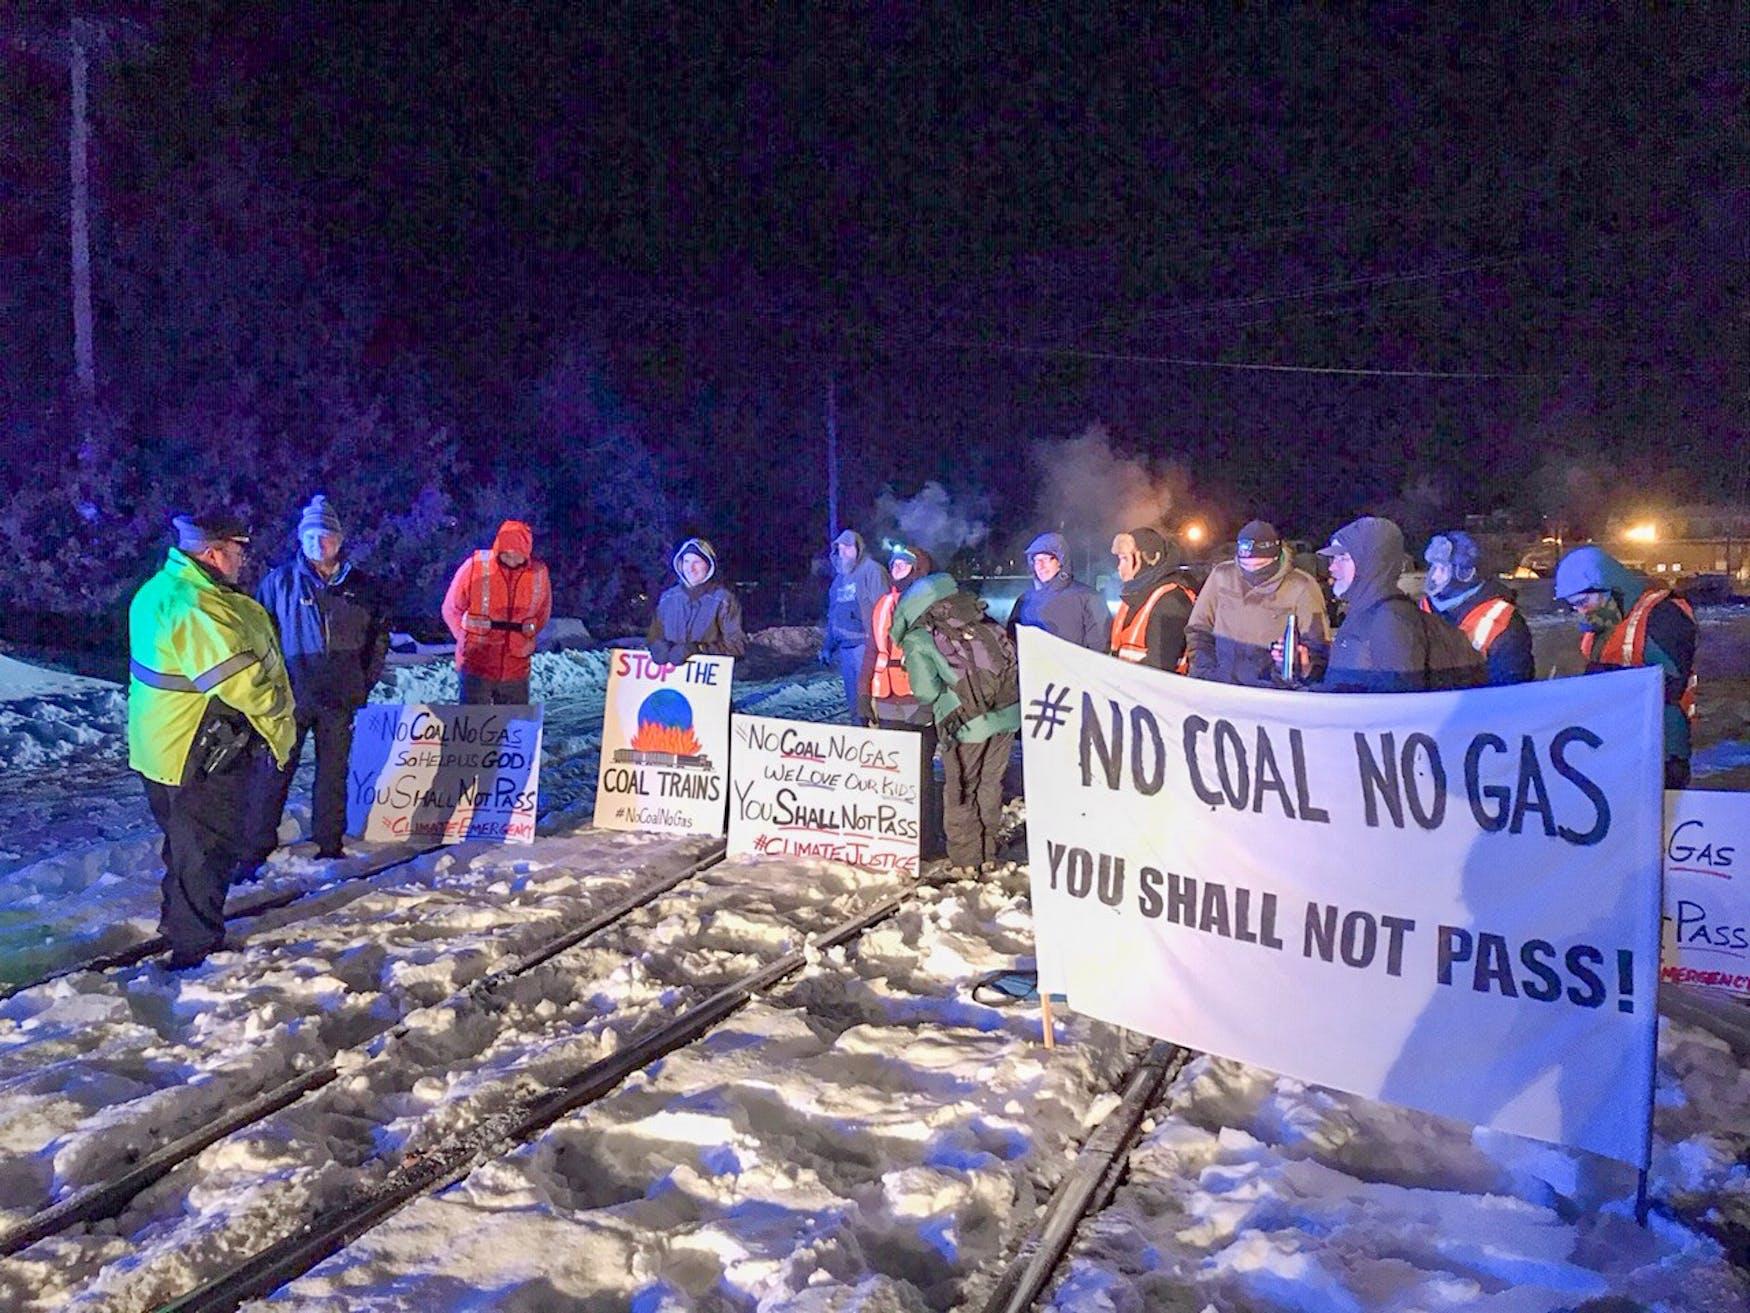 2019-12-08_No Coal No Gas banner & Ayer Police Sgt. John MacDonald.jpg